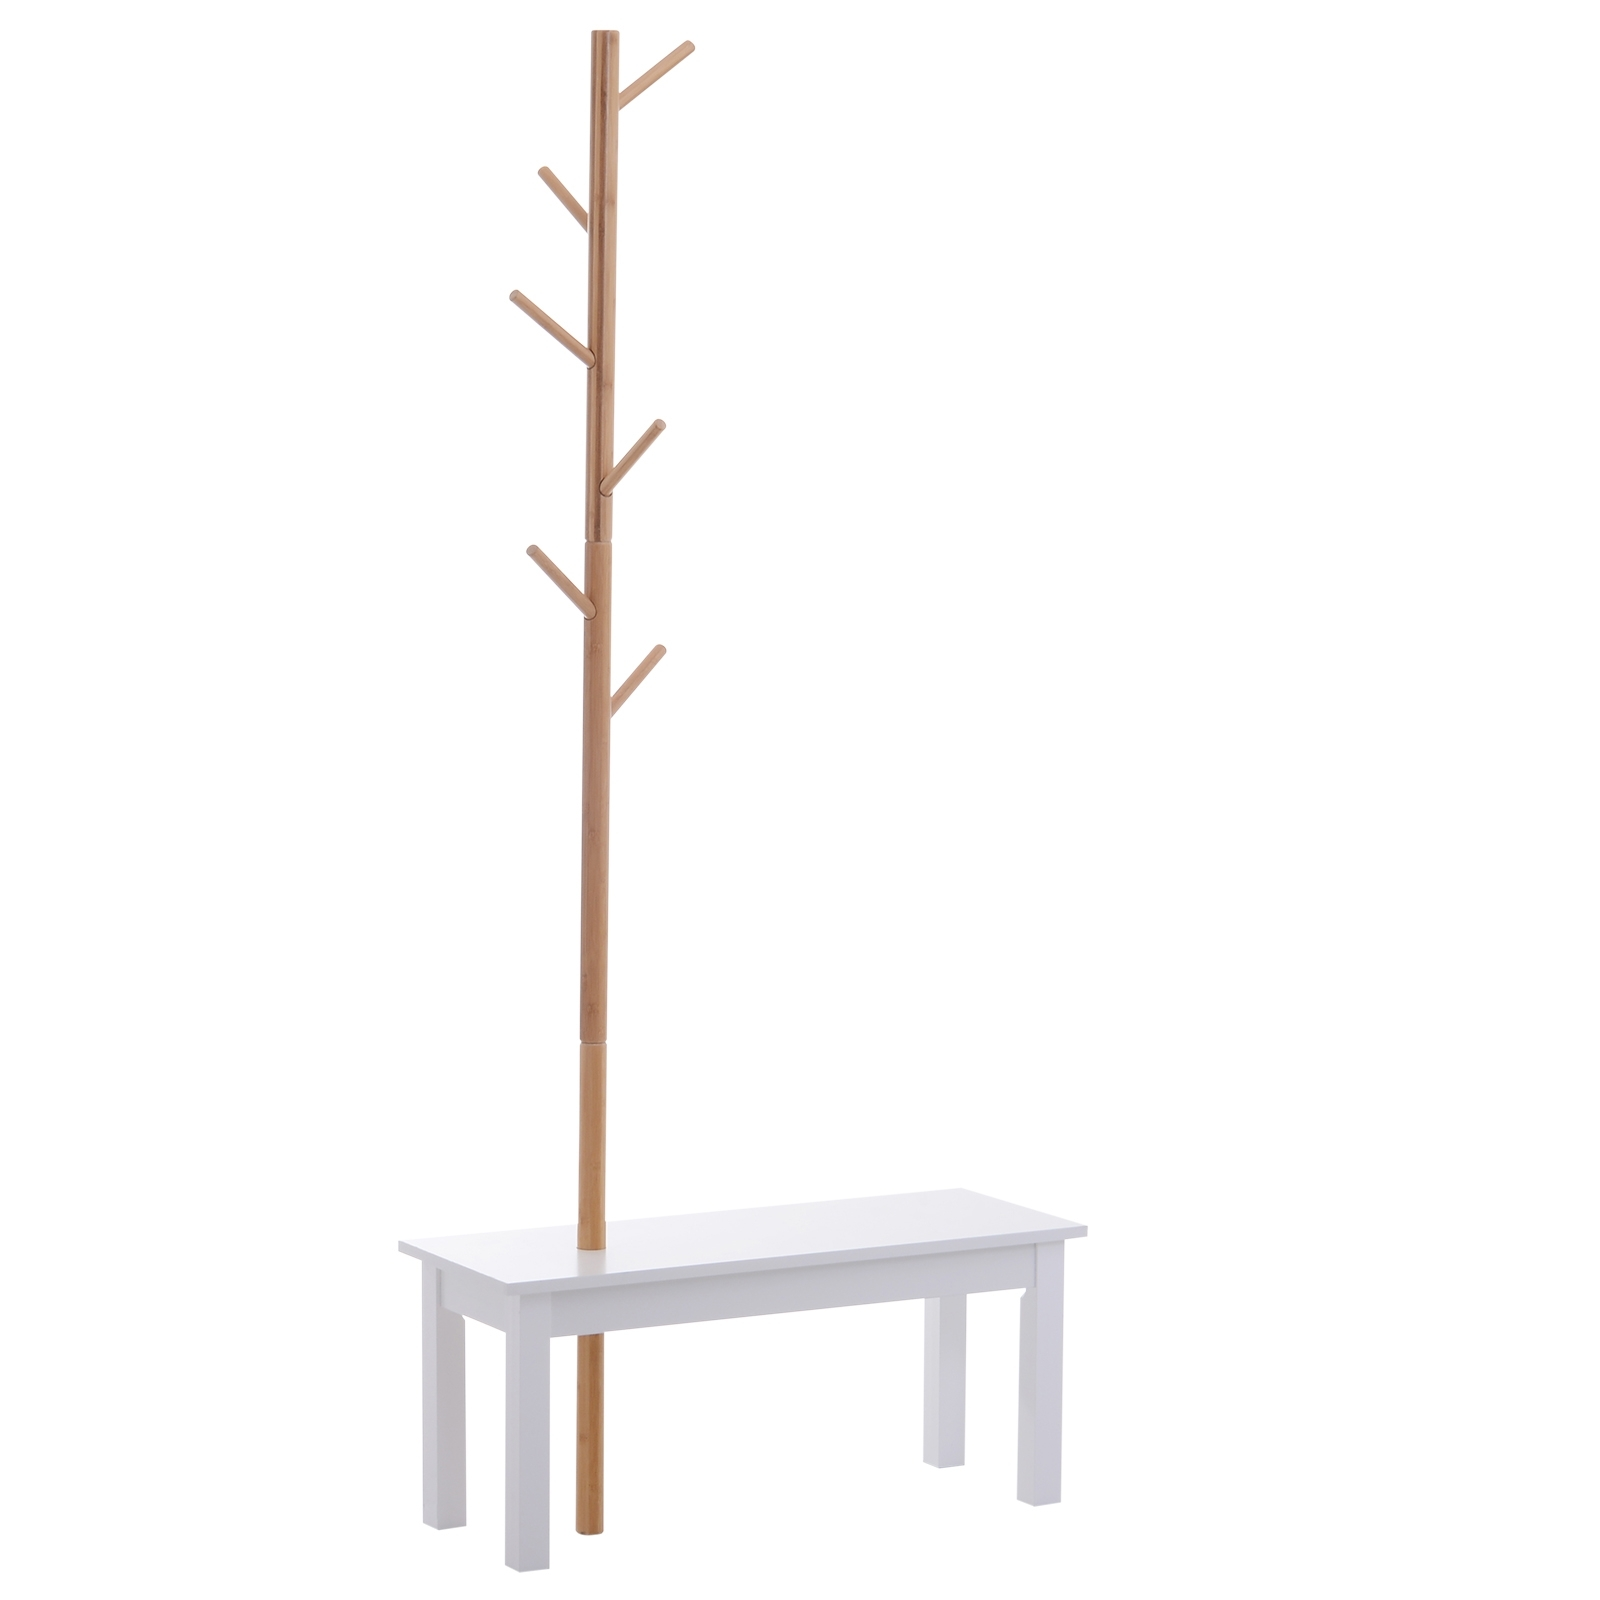 Homcom Banc Porte-Manteaux Design Cosy en MDF Bambou 80 x 30 x 180 cm